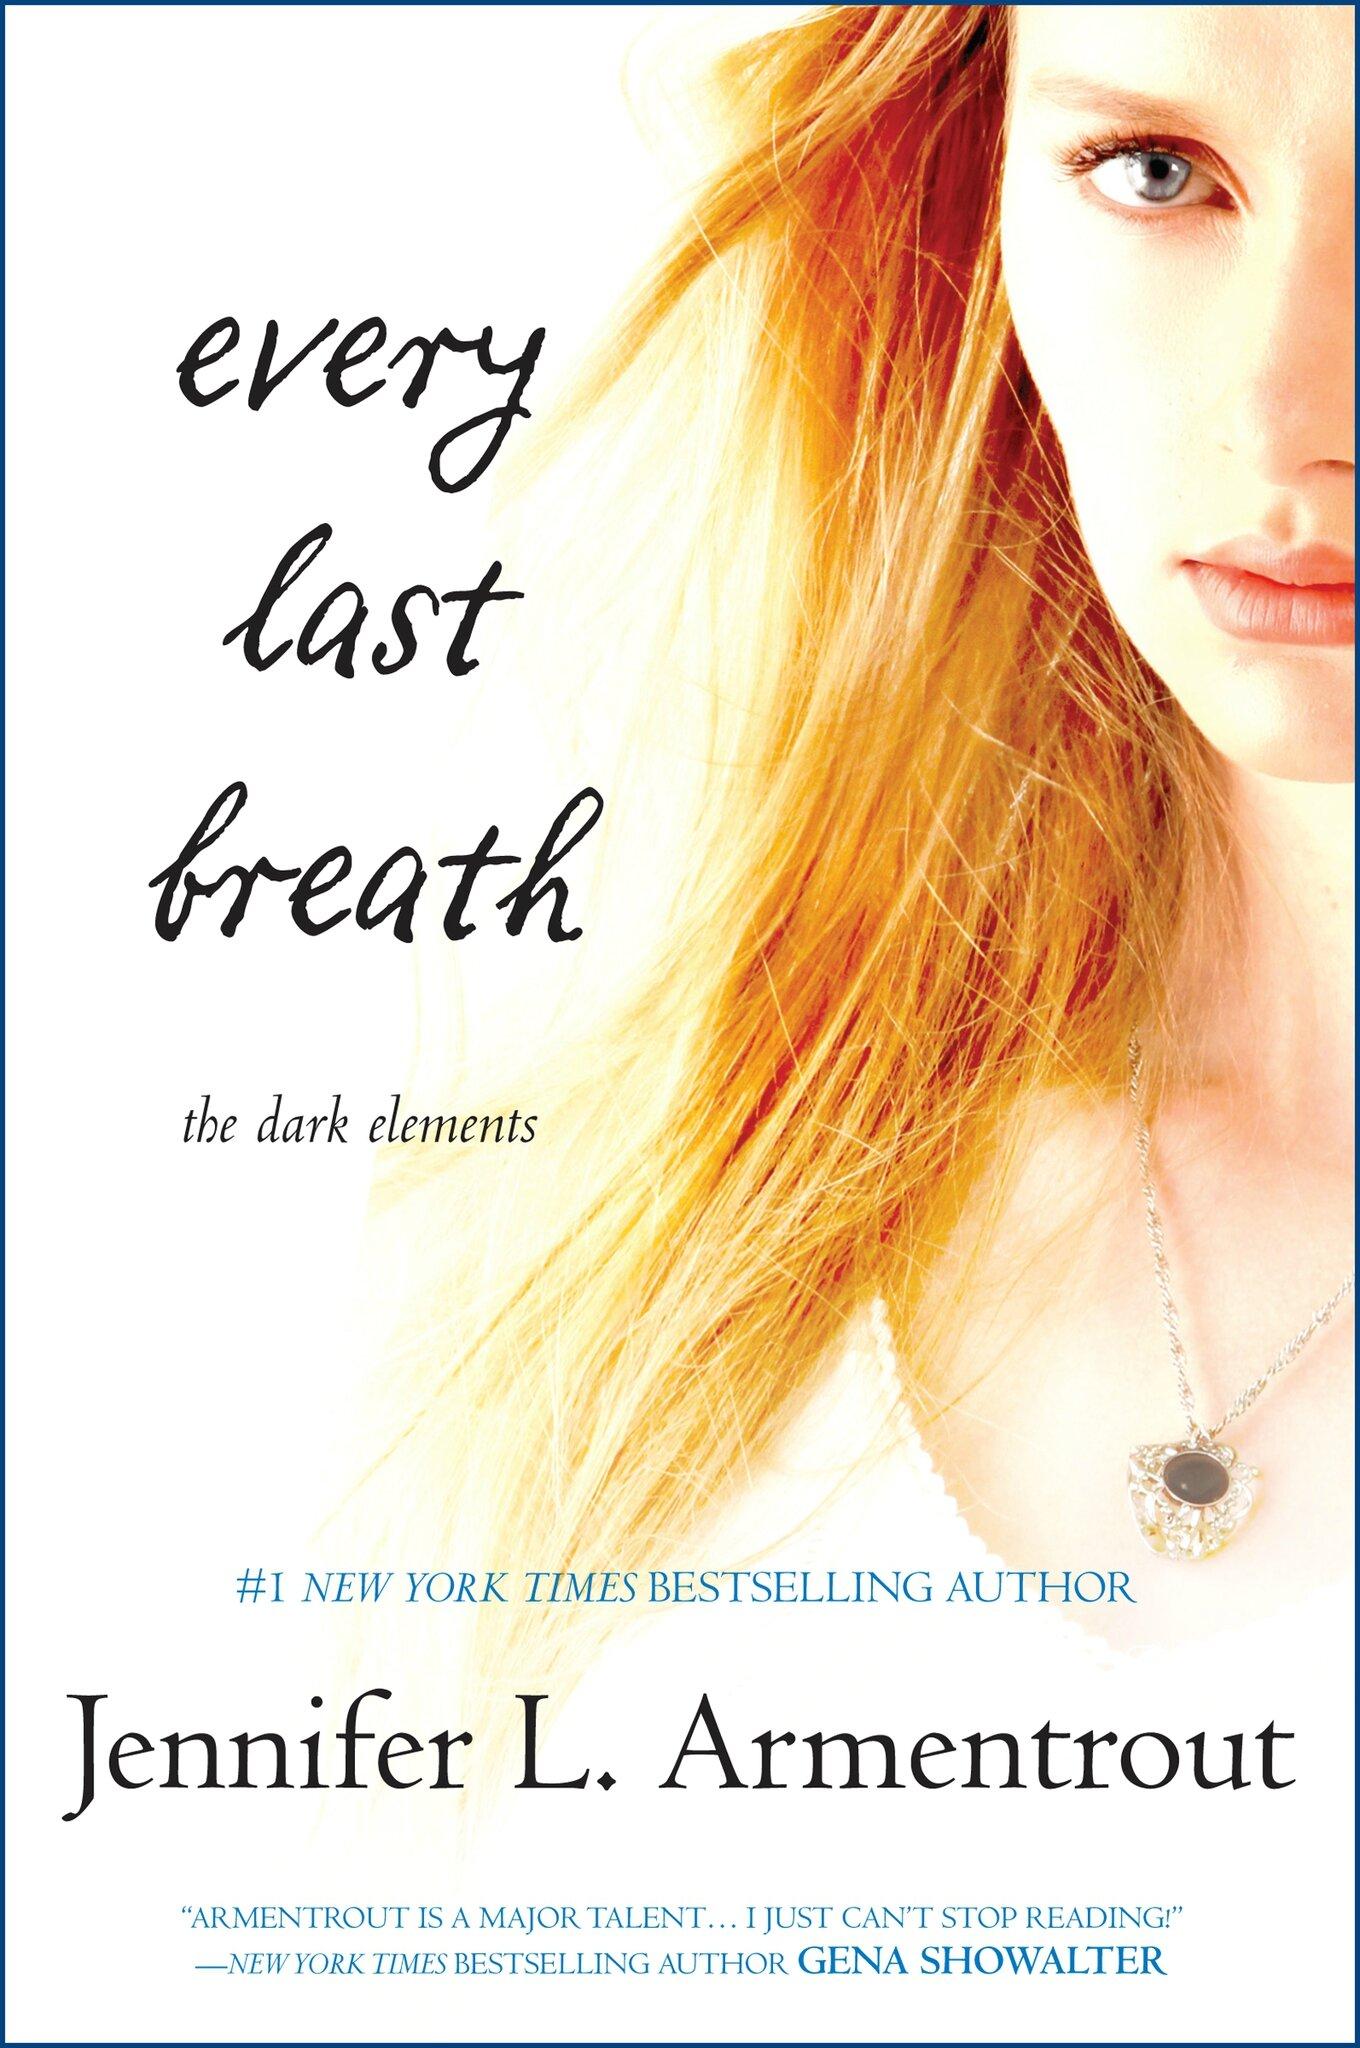 Dark Elements - Every Last Breath J